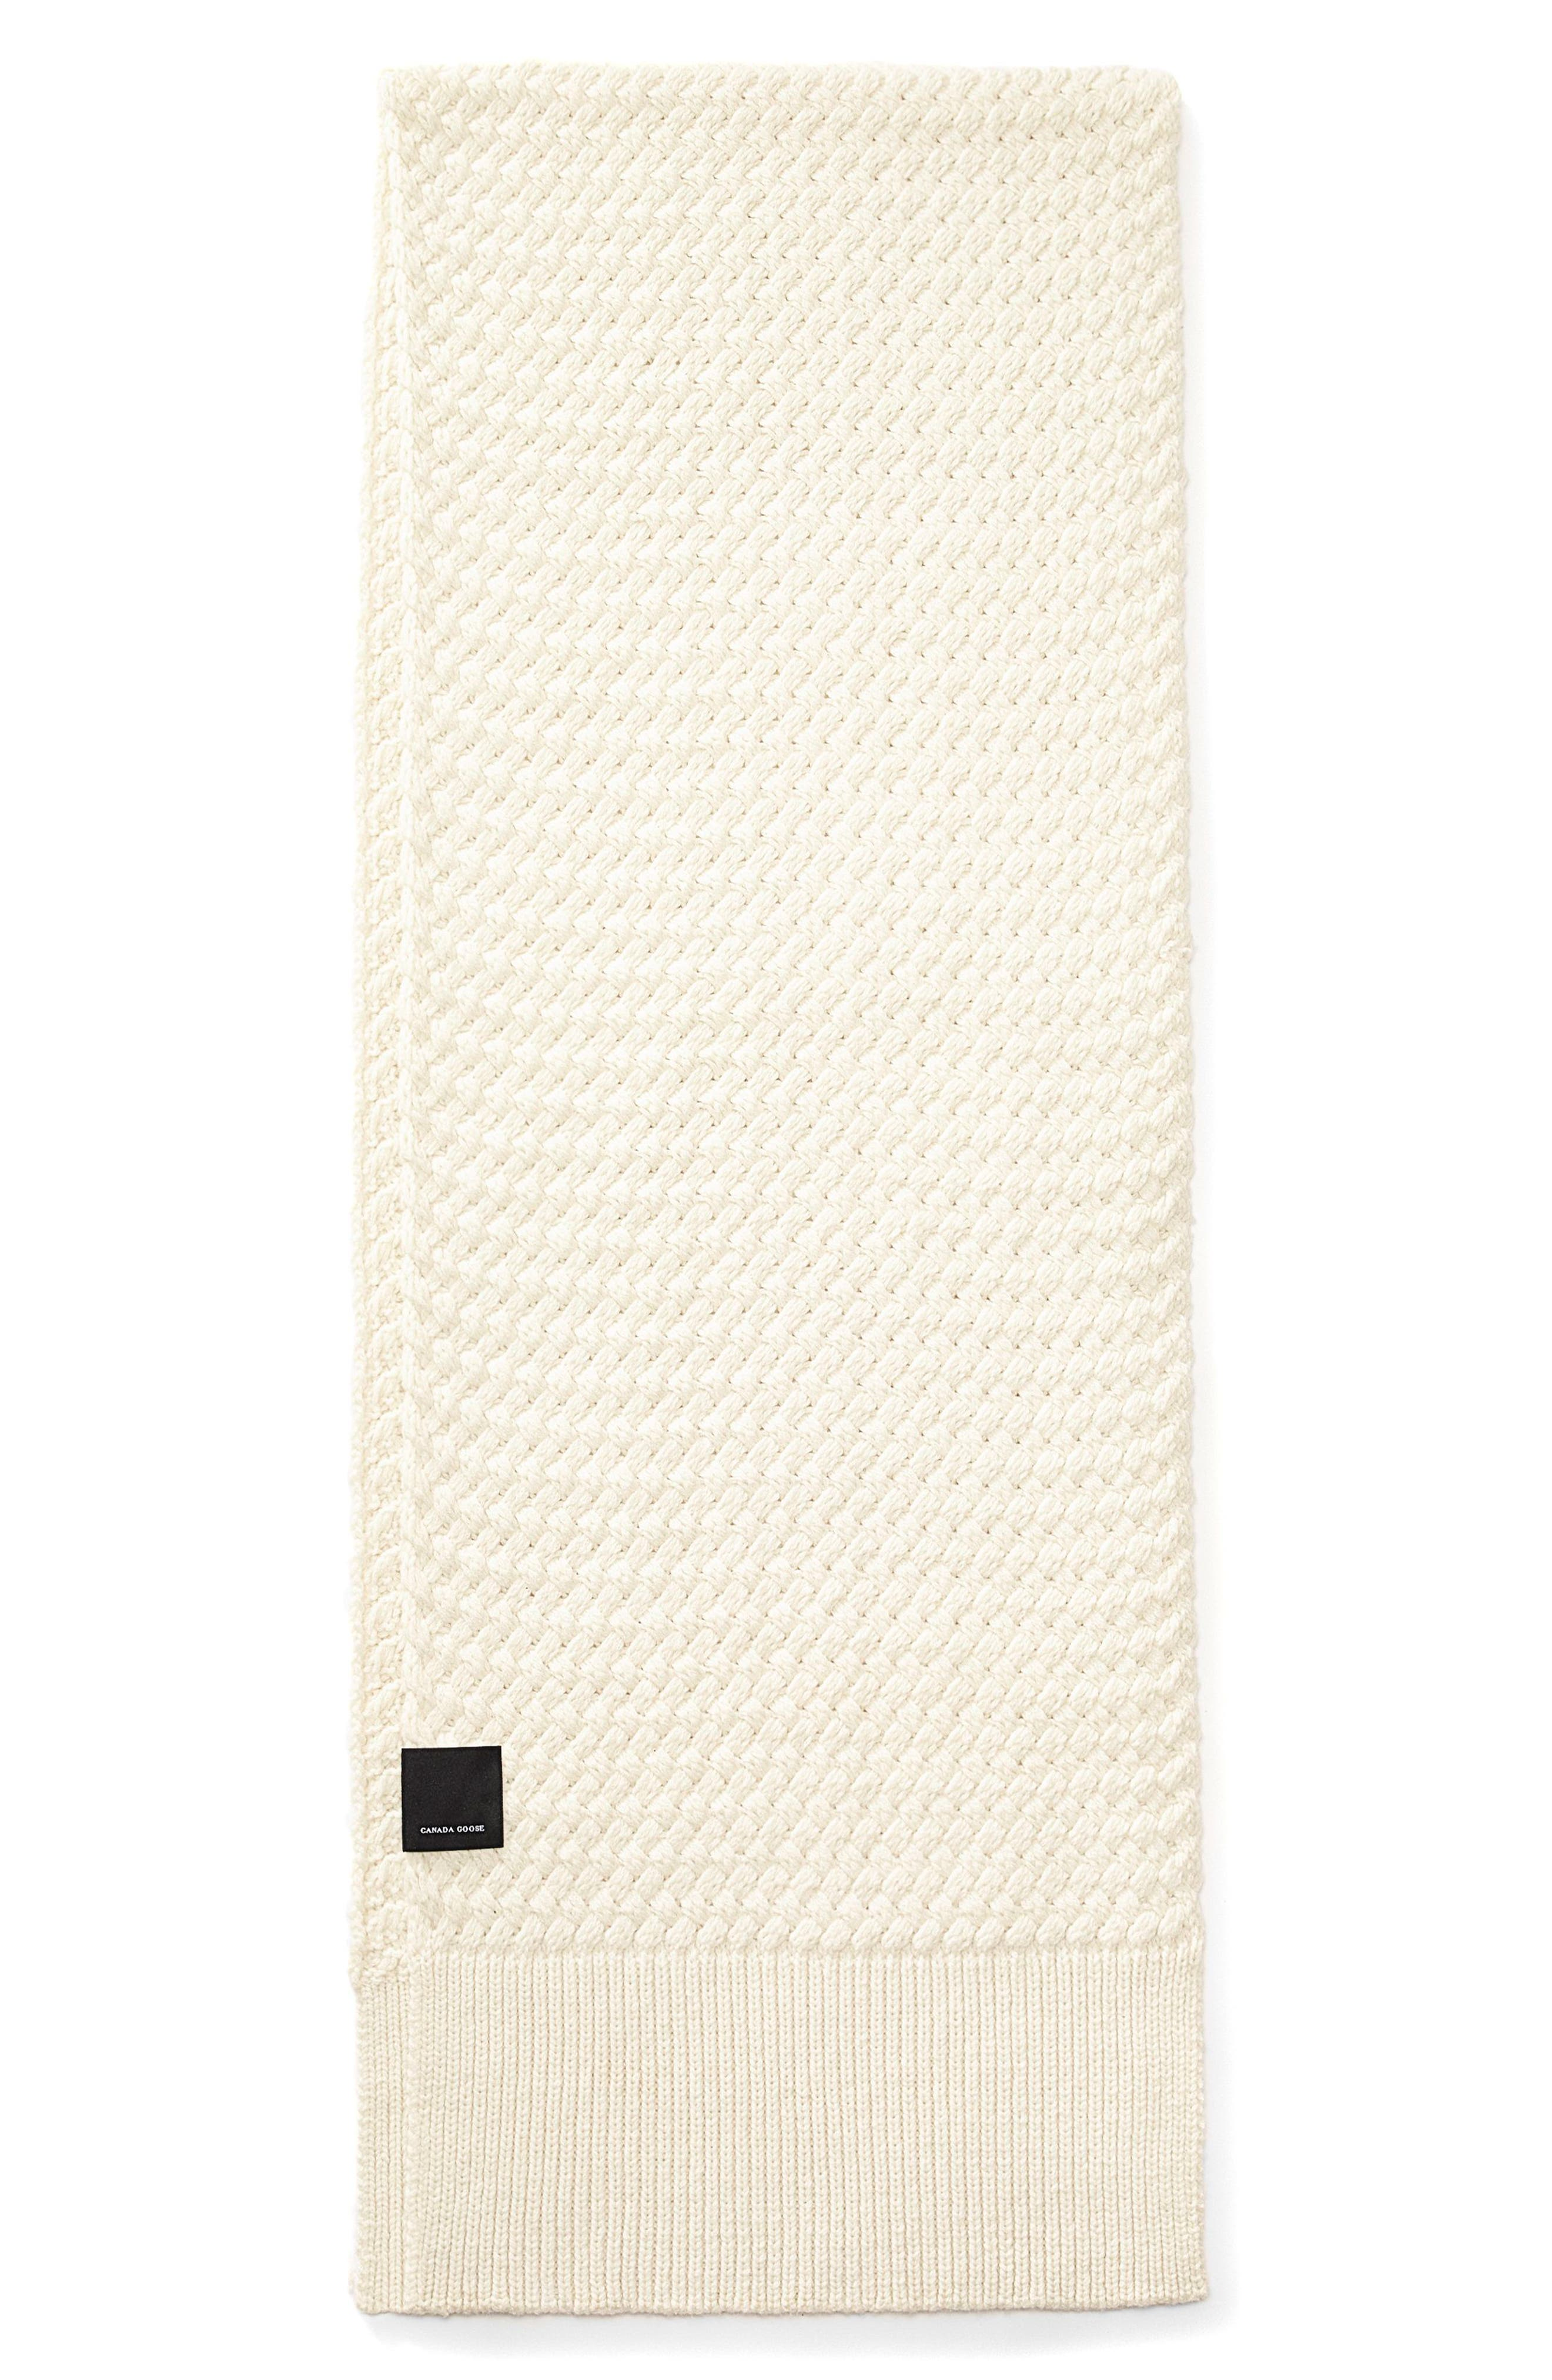 Alternate Image 1 Selected - Canada Goose Basket Weave Merino Wool Scarf